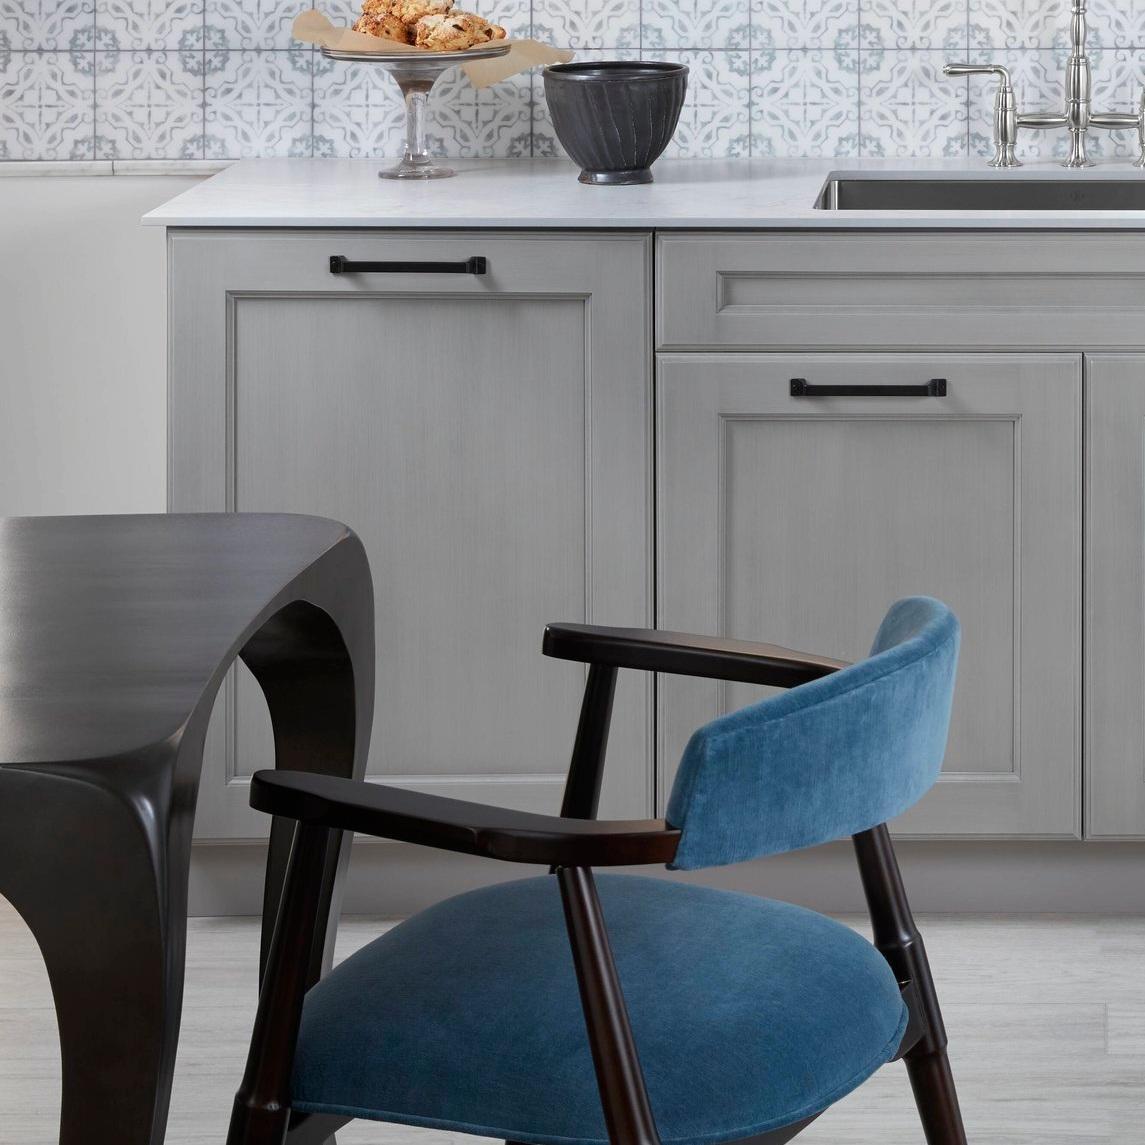 TAPIS DECOR - stool